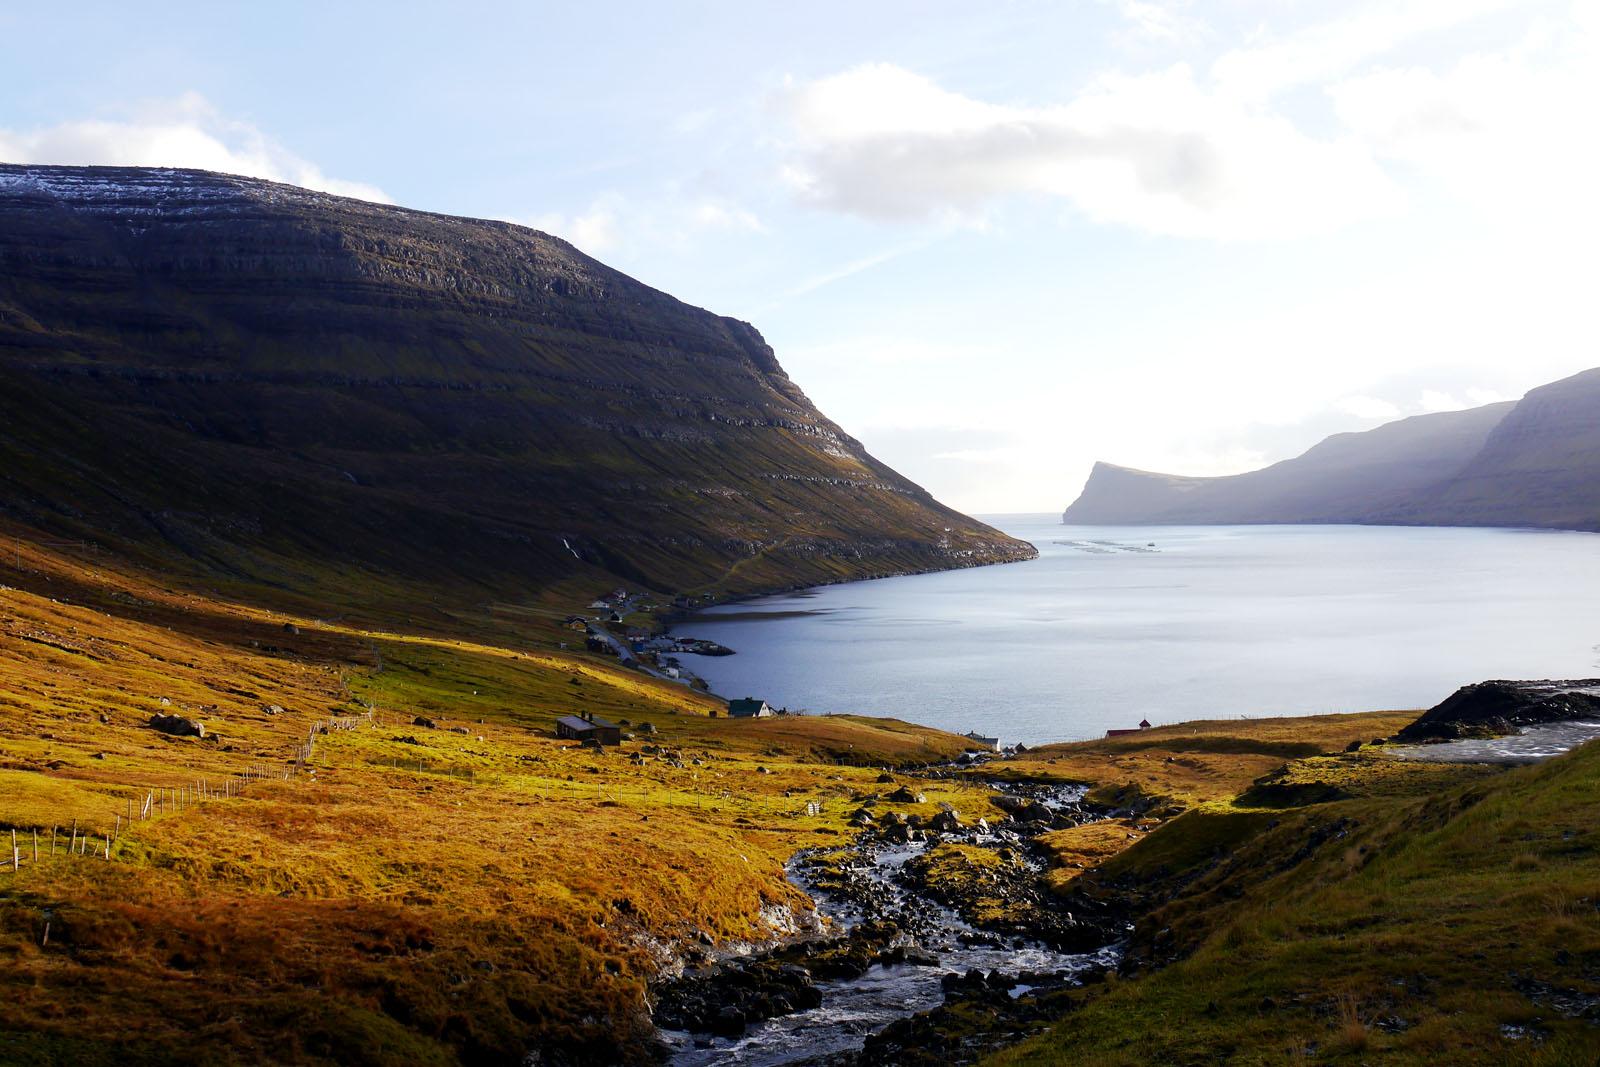 Bordoy, Faroer Inseln, Fjord und Berge